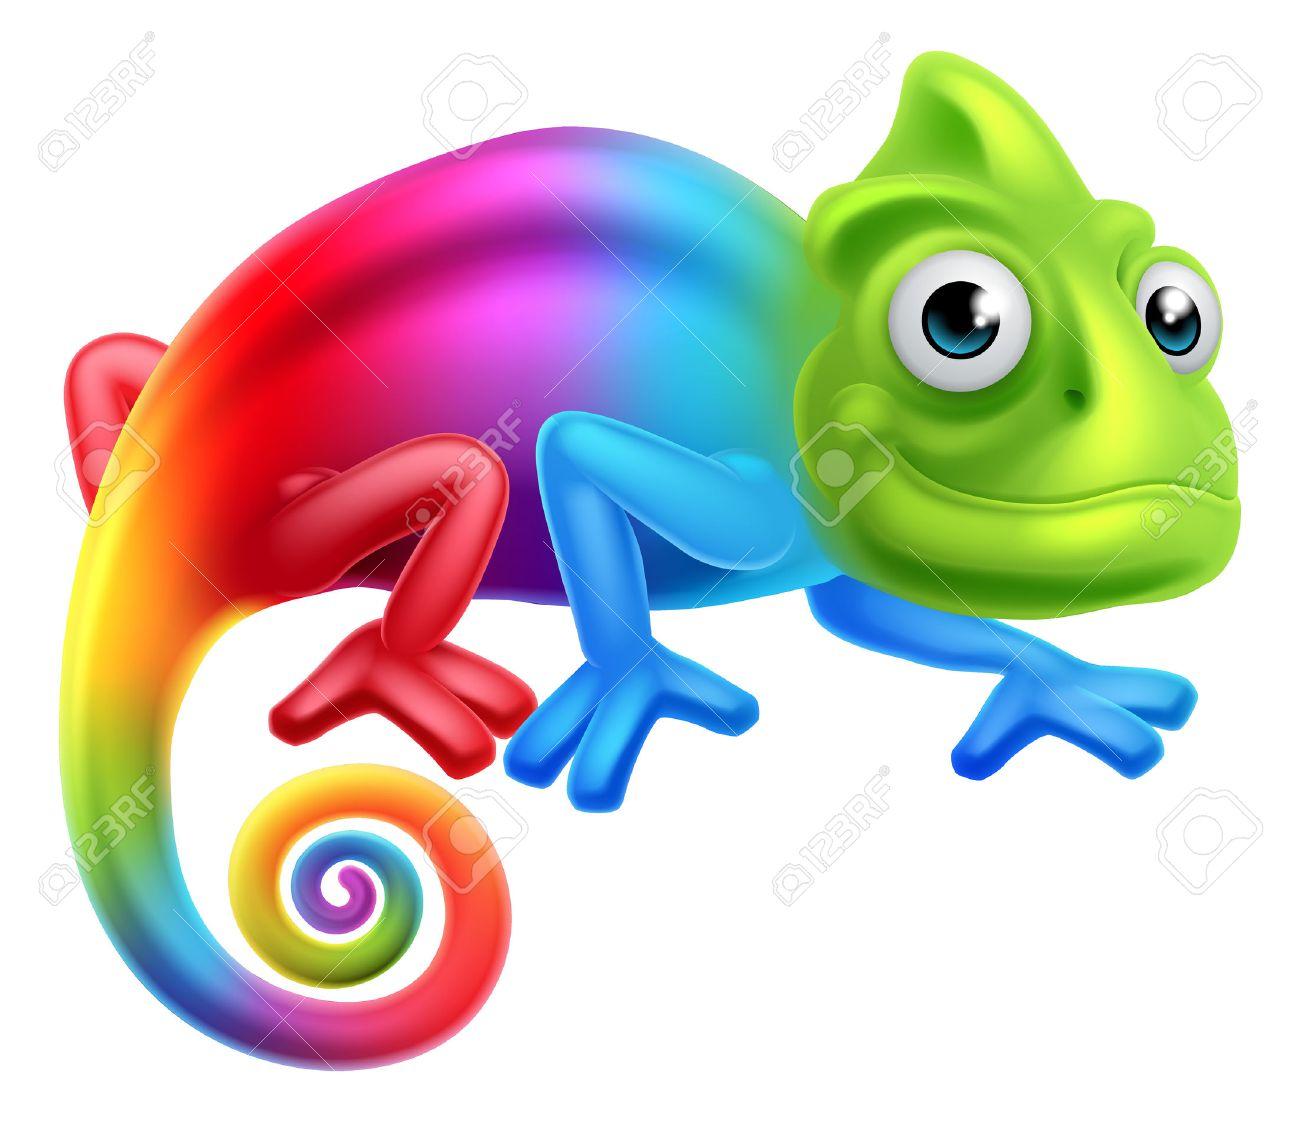 Clipart Strikingly Ideas Cham - Chameleon Clipart